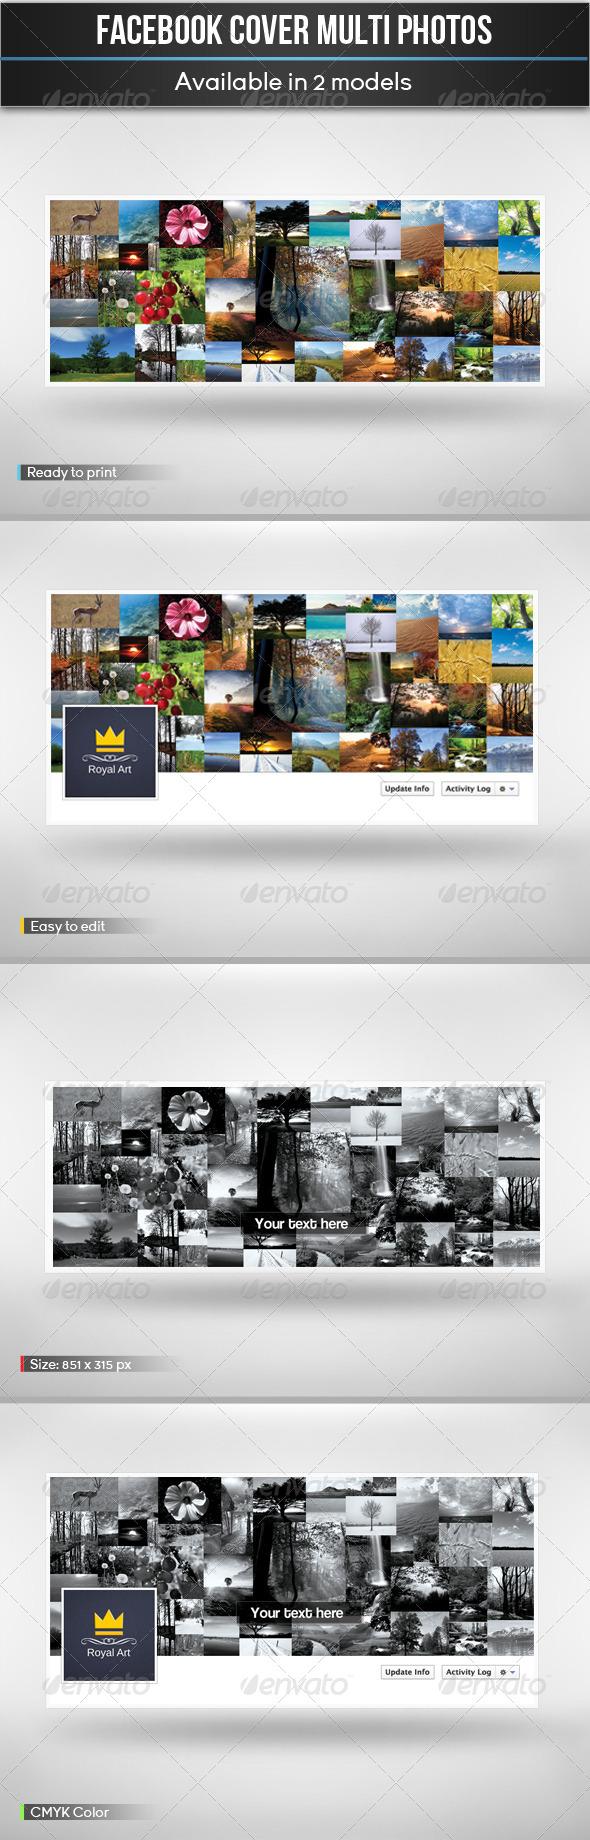 GraphicRiver Facebook Cover Multi Photos 5139602